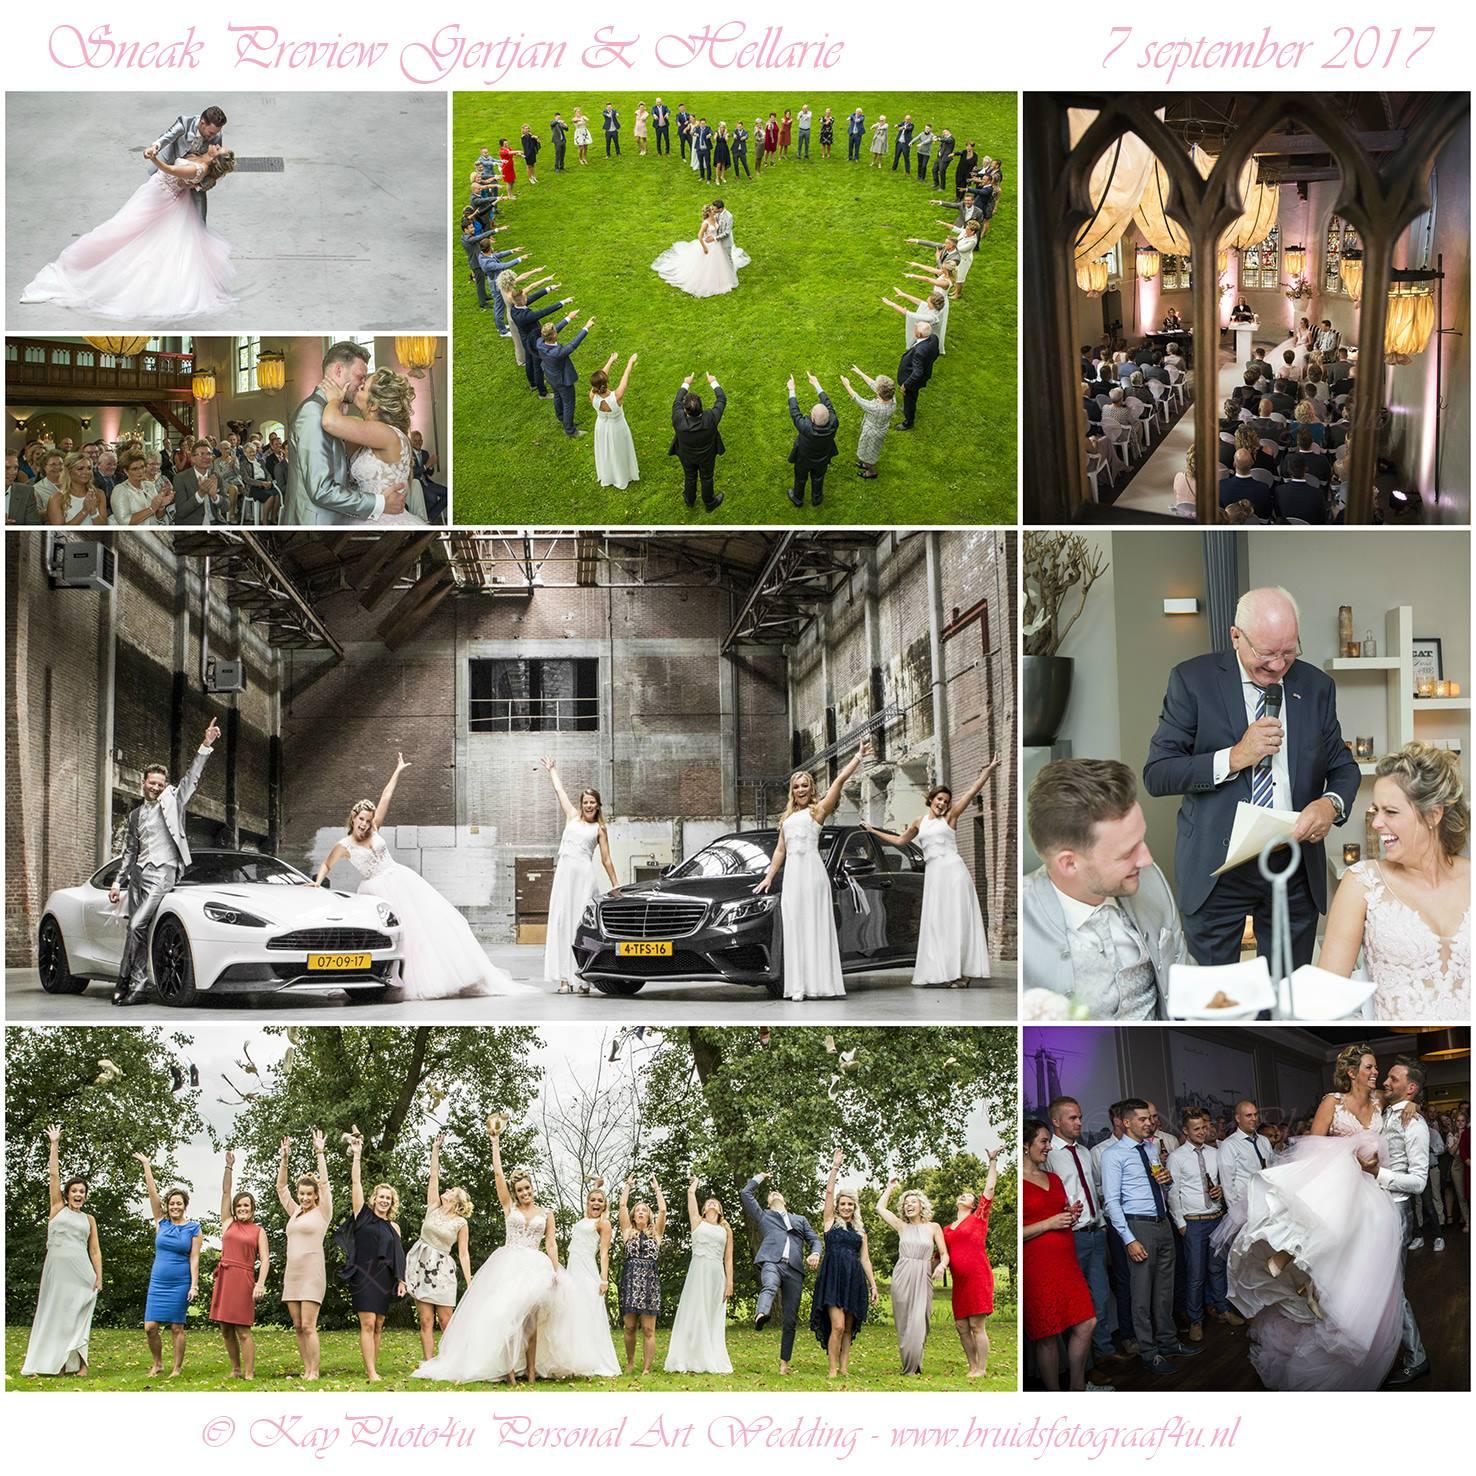 trouwreportage Klooster Betlehem, bruidsfotograaf, trouwfotograaf, huwelijksreportage, bruidsreportage, trouwreportage, trouwfoto's, trouwfotografie, bruidsfotografie, trouwen, trouwen Klooster Betlehem, Veghel, Trouwen Werkendam,  feestlocatie de Ontmoeting Werkendam, De Ontmoeting Werkendam, Werkendam, WEdding, wedding photographer, wedding photograhy, award winning photographer wedding, award wedding, trouwfotograaf brabant, trouwfotograaf veghel, trouwfotograaf haren, trouwfotograaf amersfoort, twee trouwfotografen, fotografen duo, huwelijksfotografie, huwelijksreportage